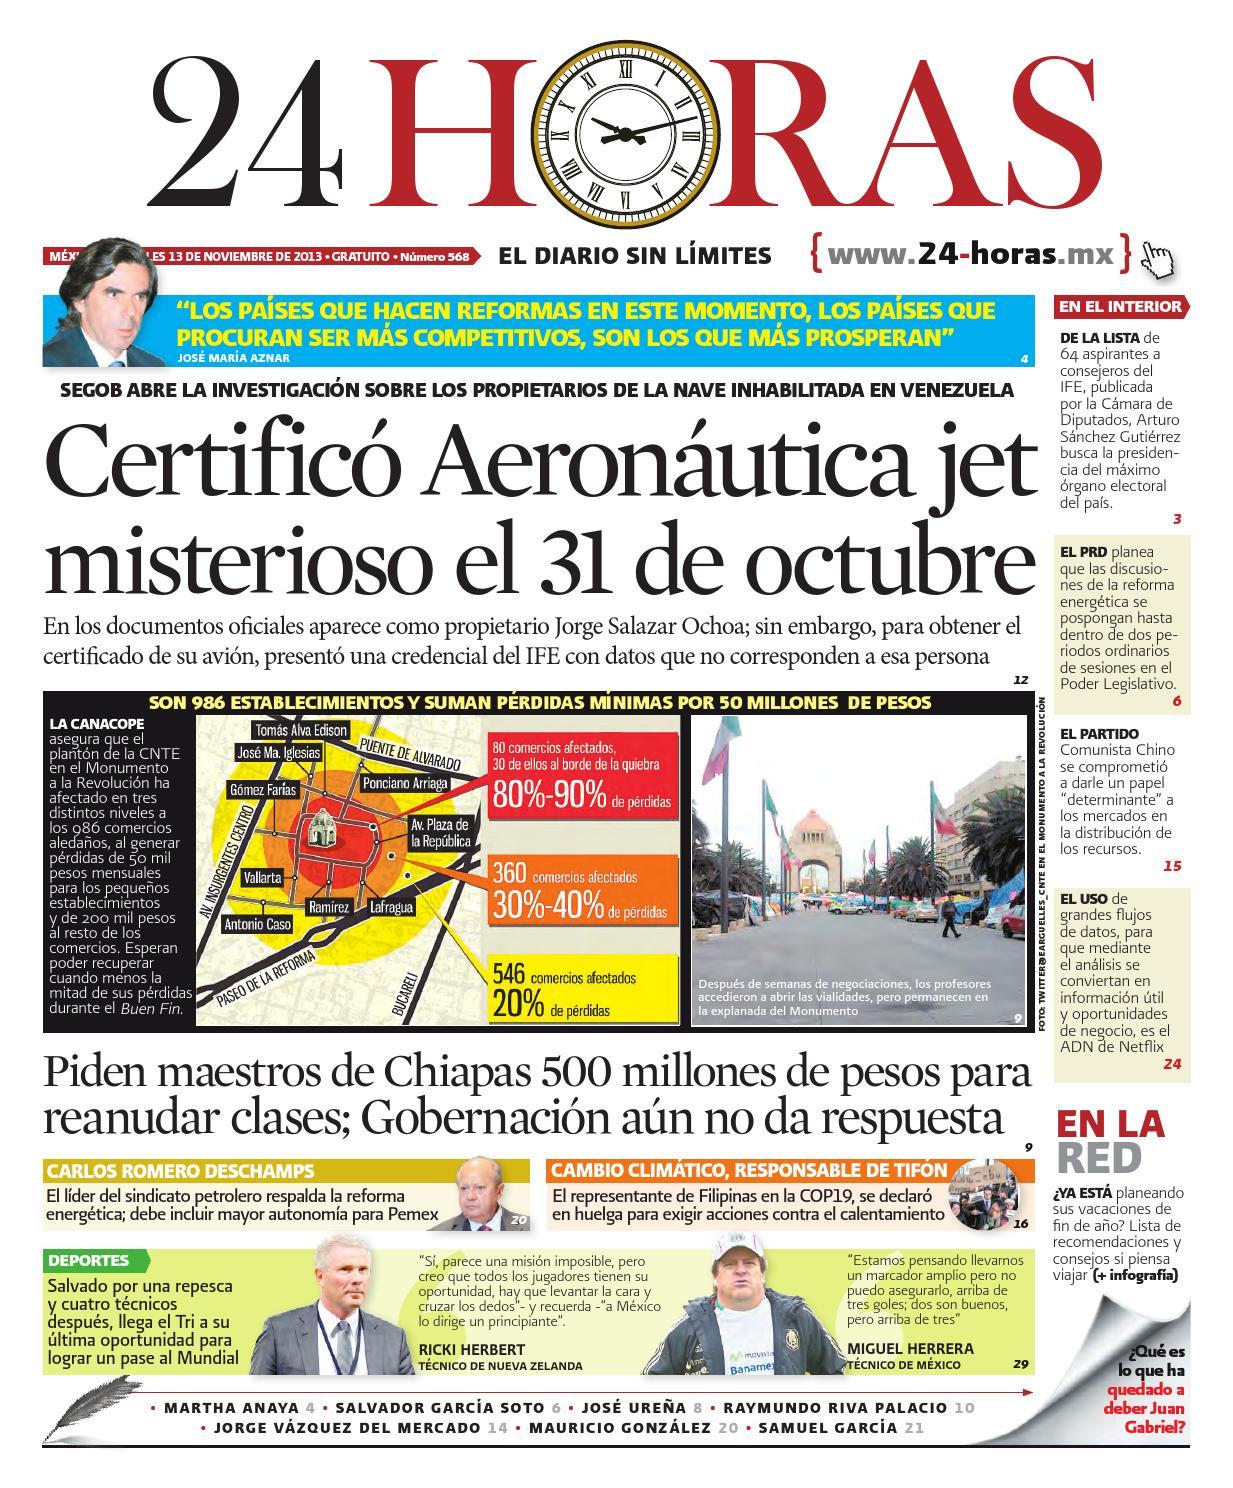 Noviembre | 13 | 2013 by Información Integral 24/7 SAPI de C.V. - issuu